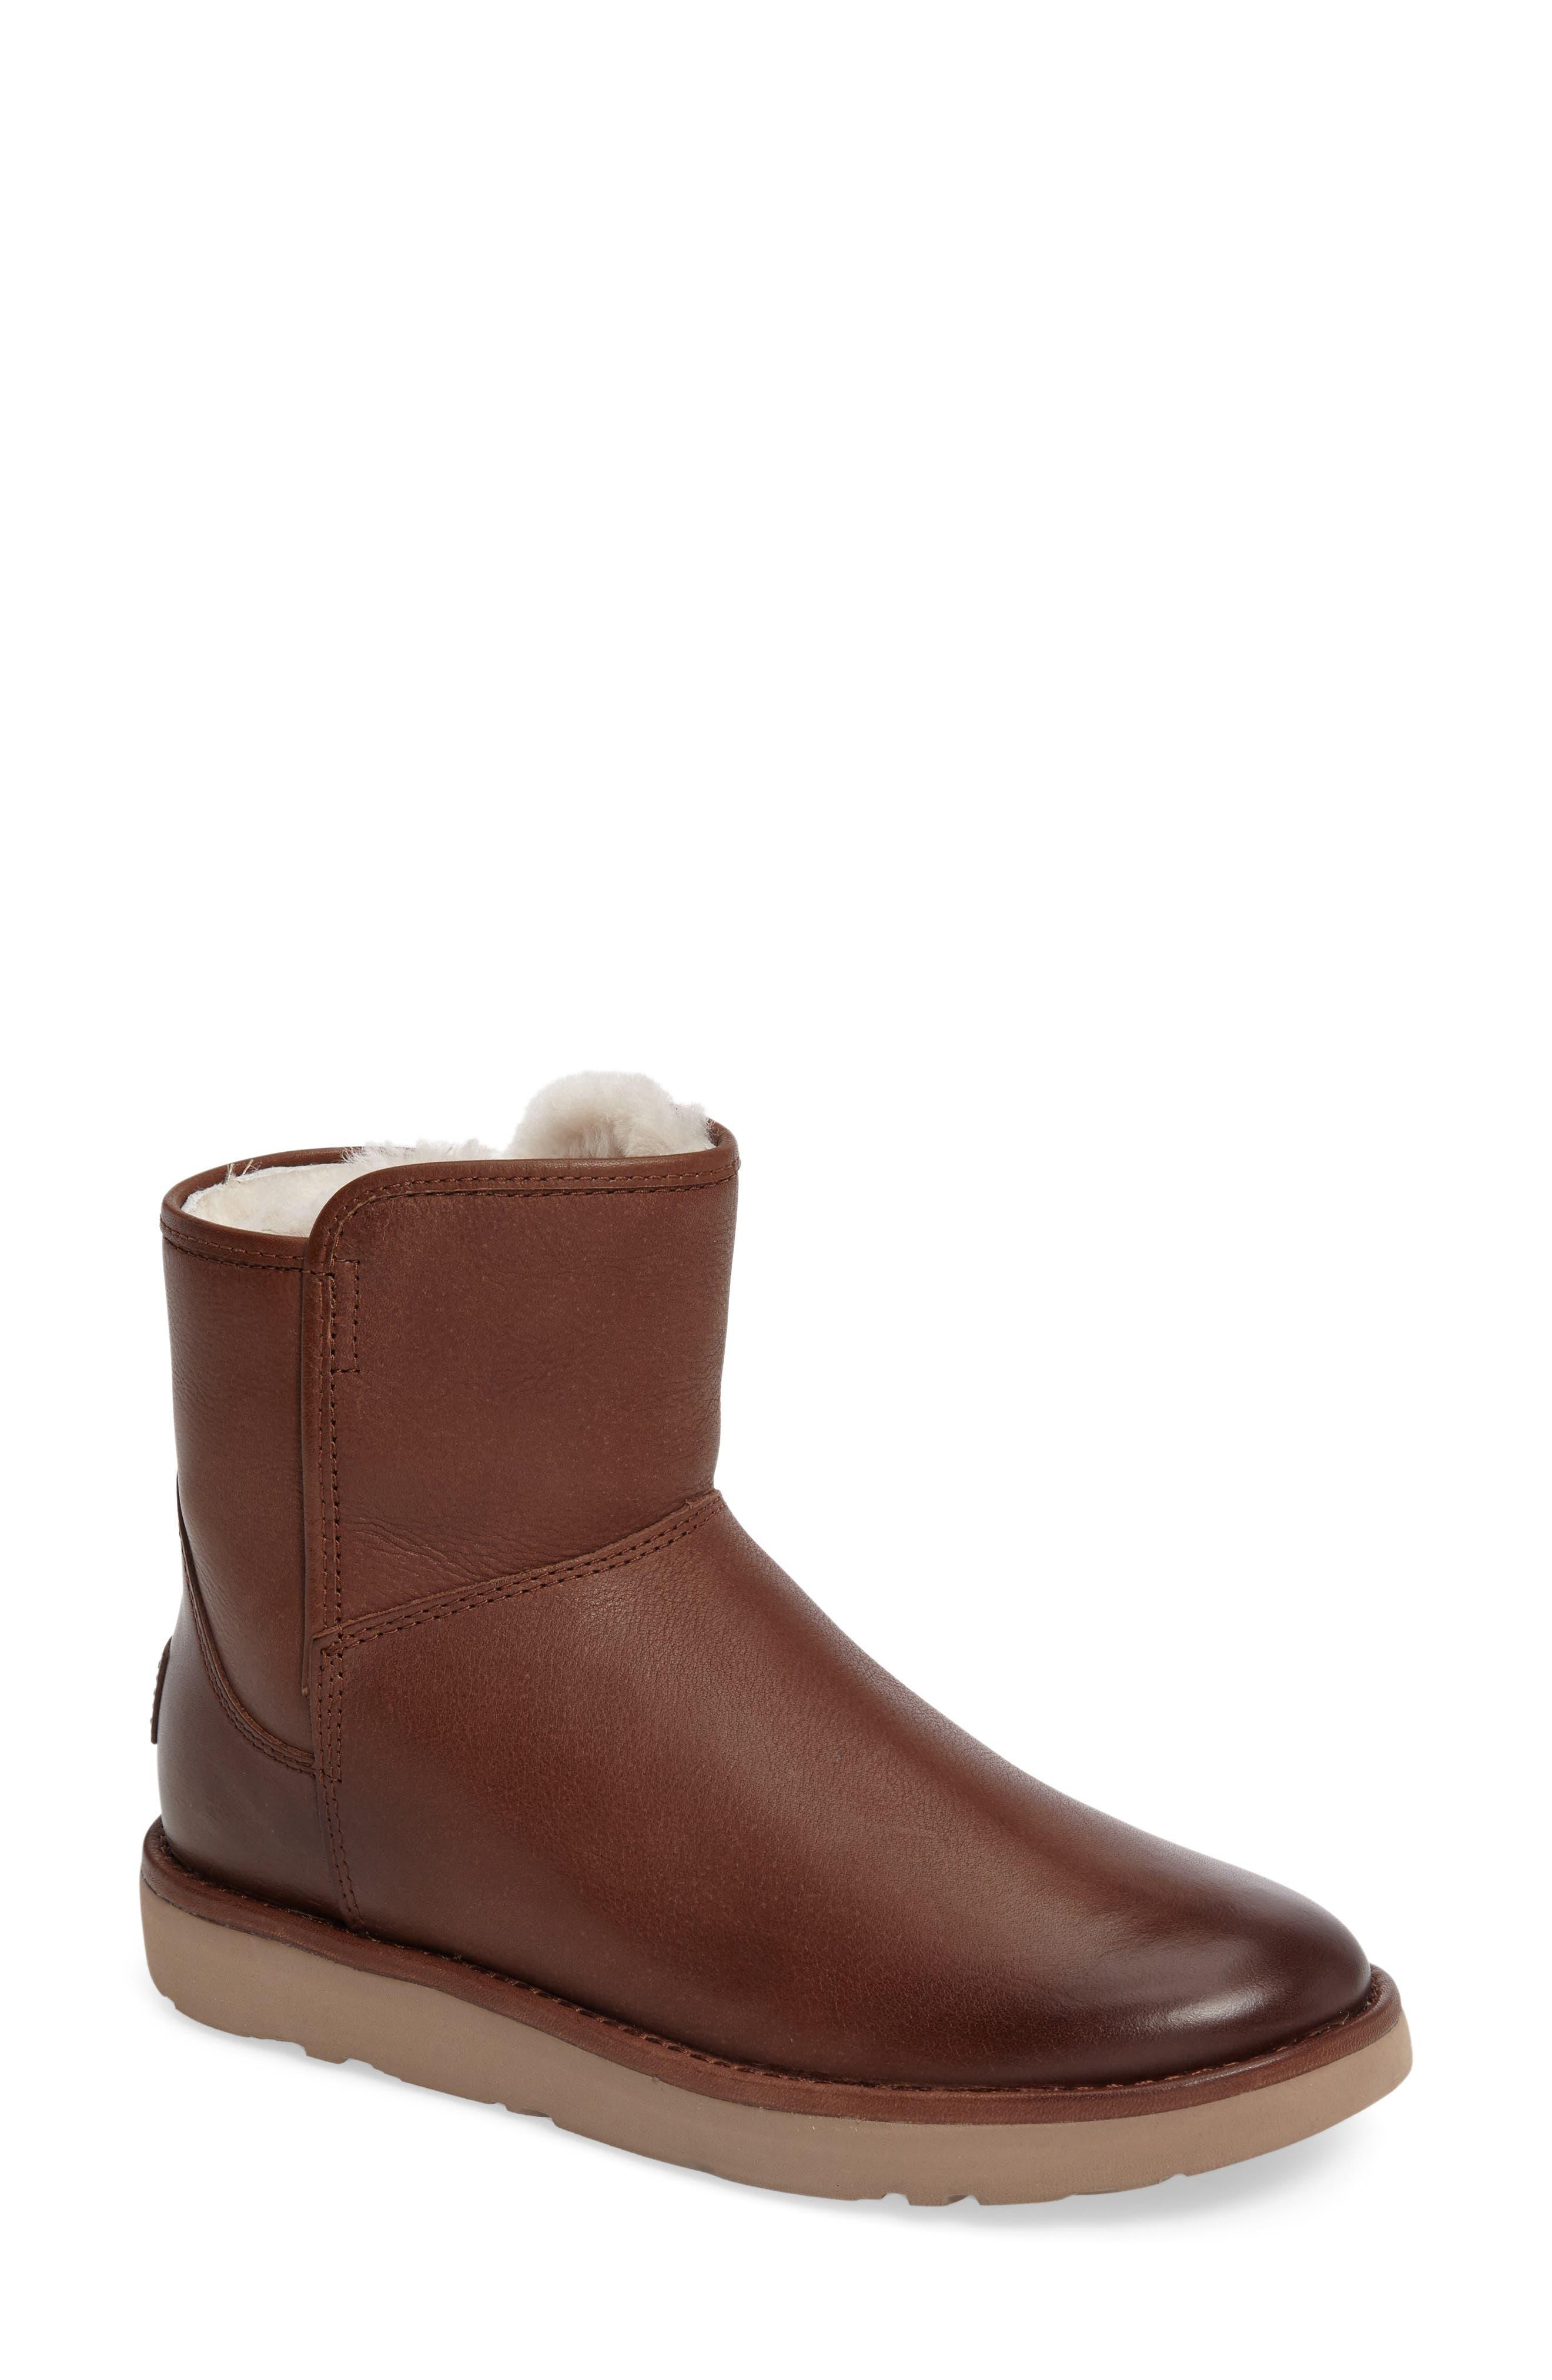 Main Image - UGG® Abree Mini Boot (Women)